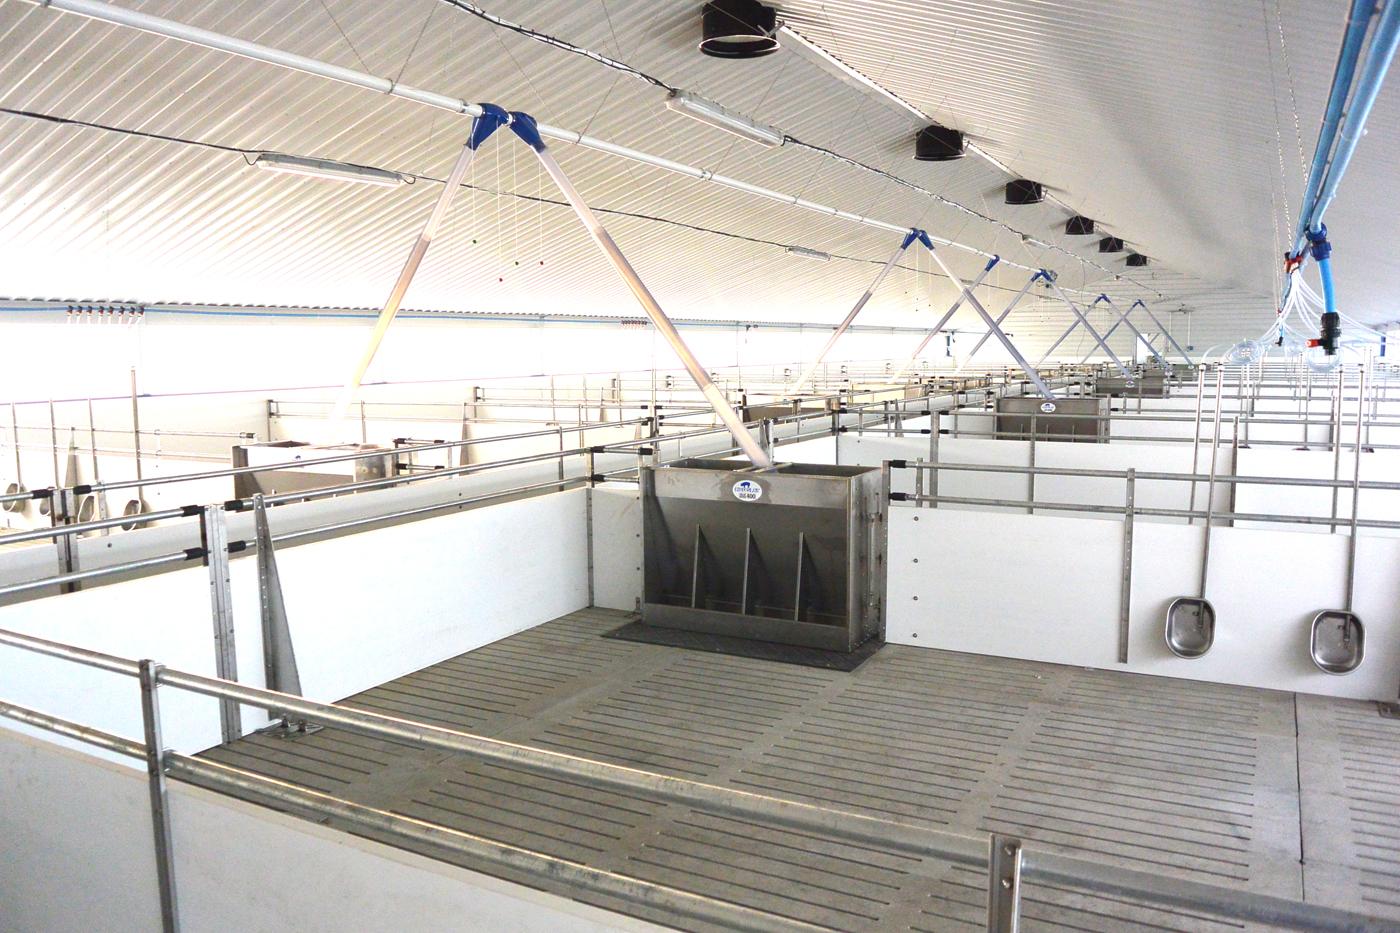 U S  style pig equipment aids producers worldwide | Feedstuffs